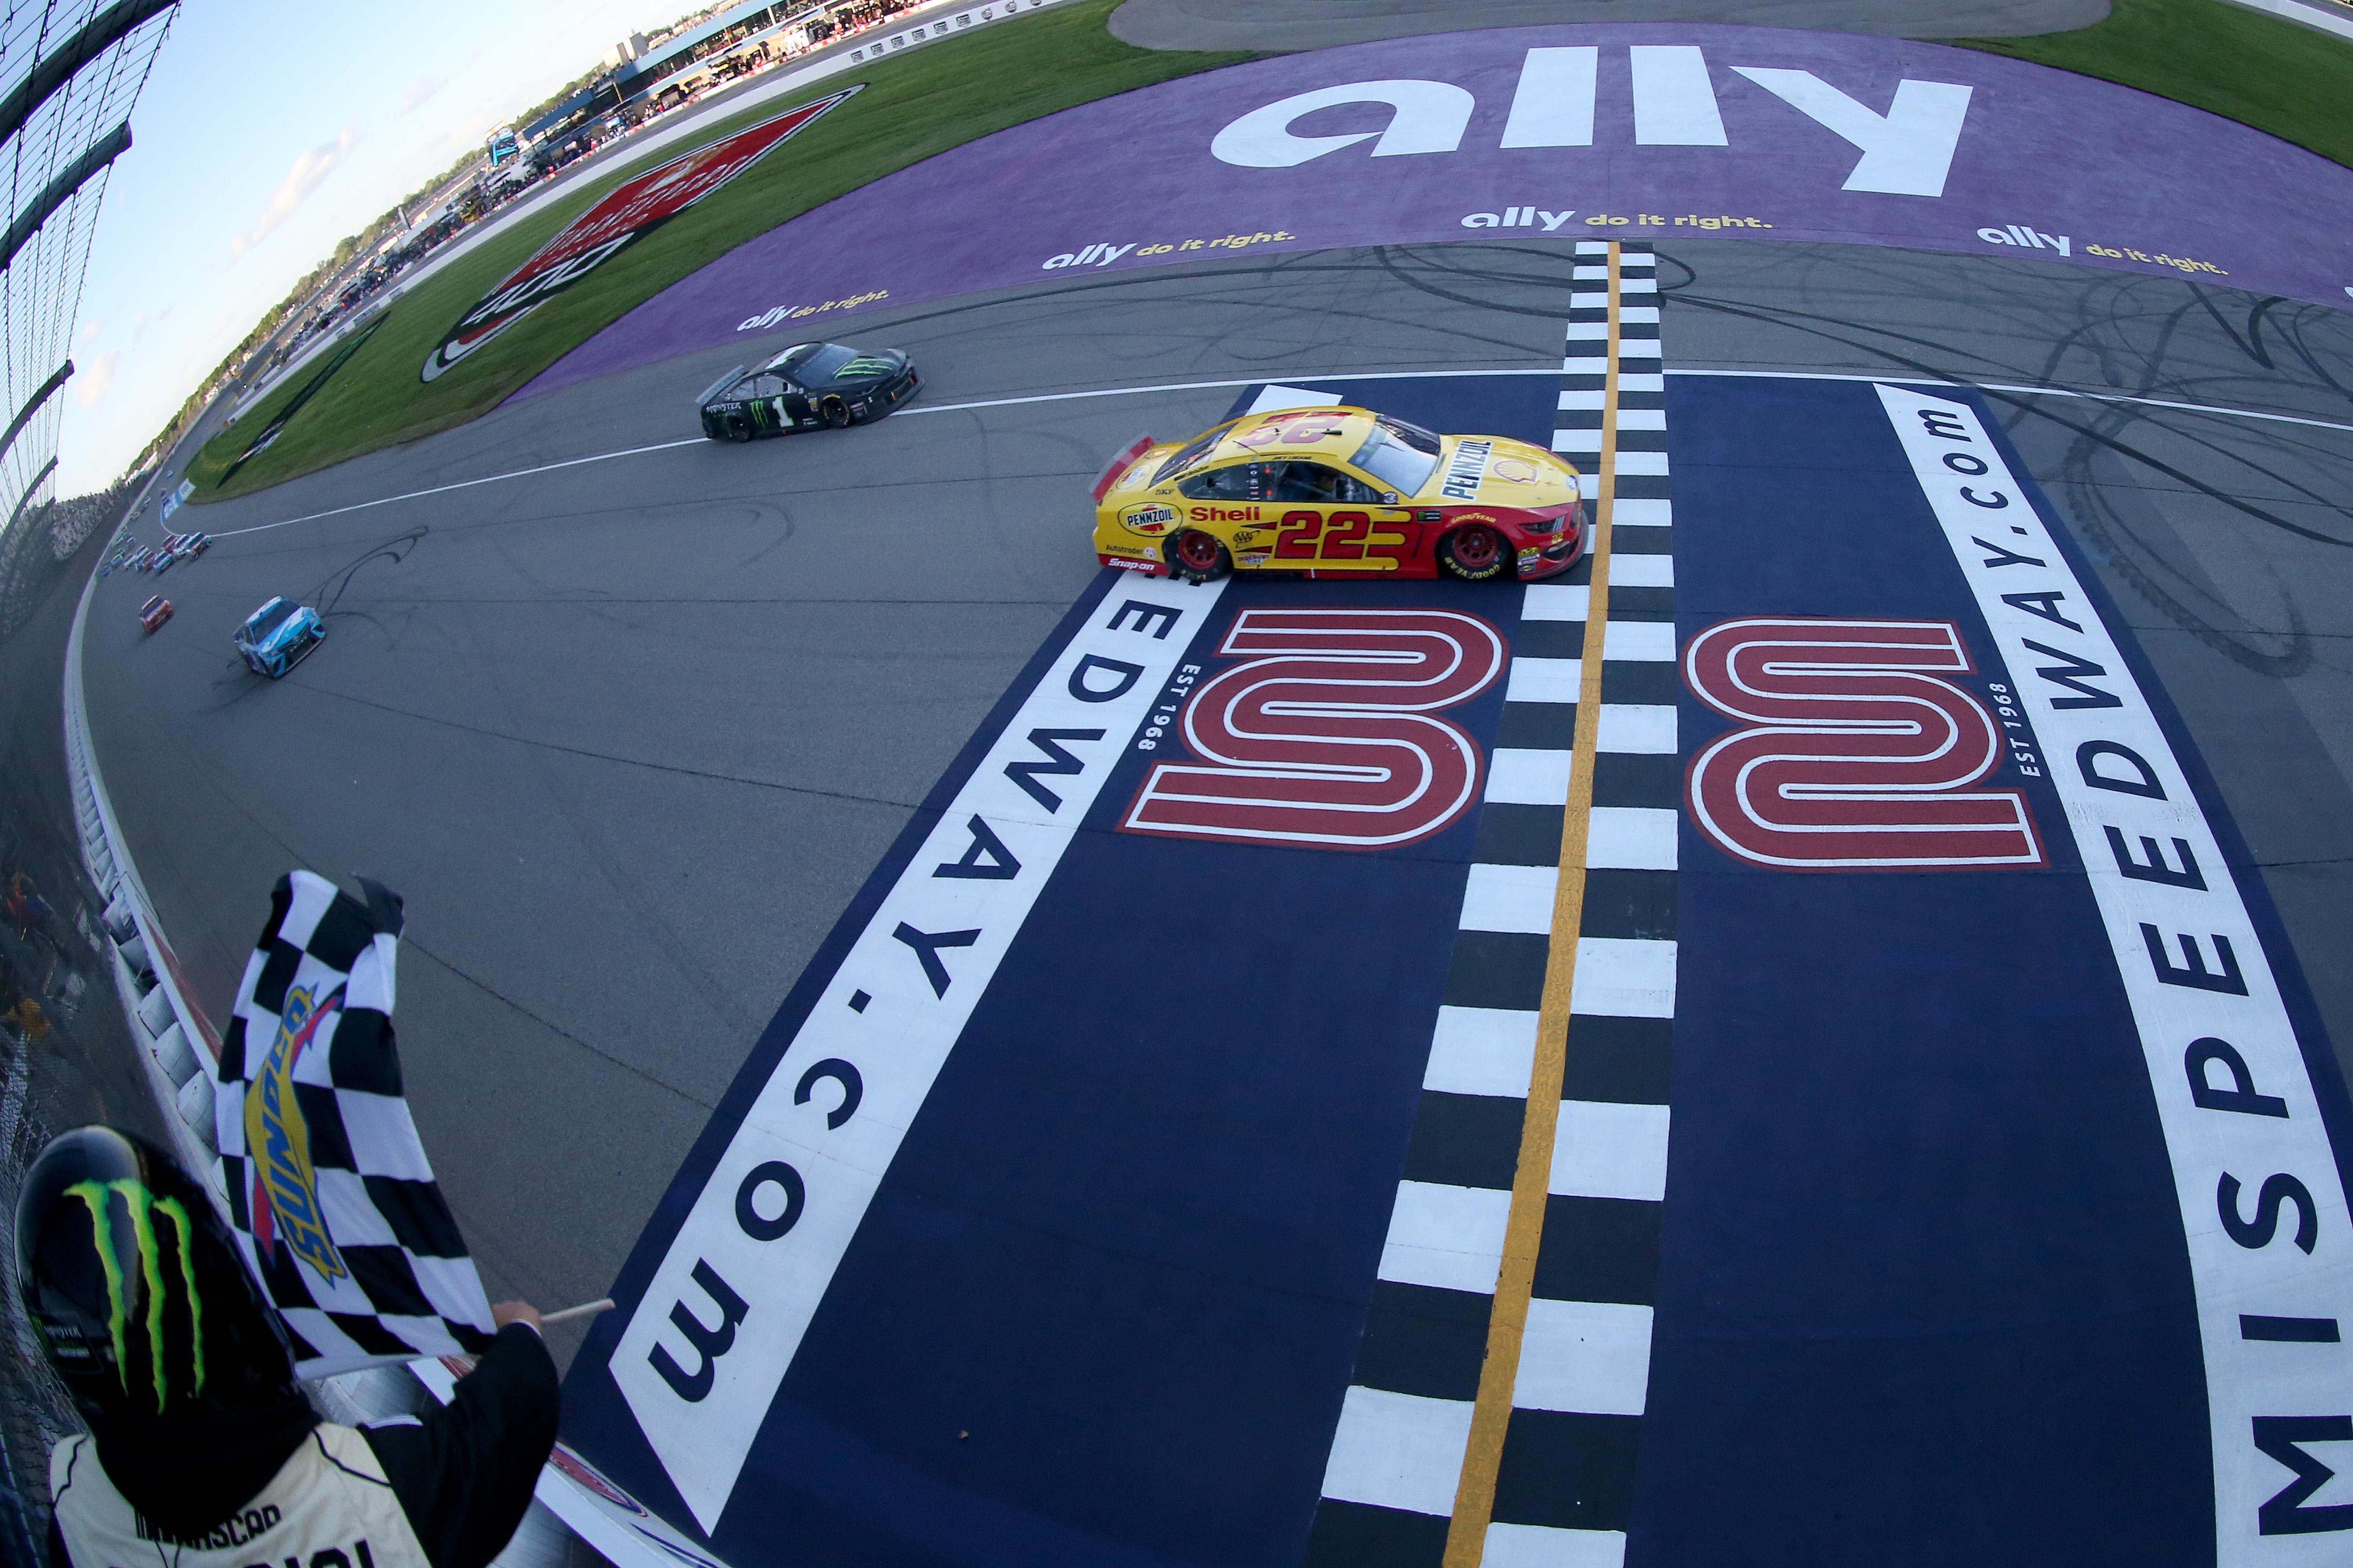 Joey Logano wins at Michigan International Speedway